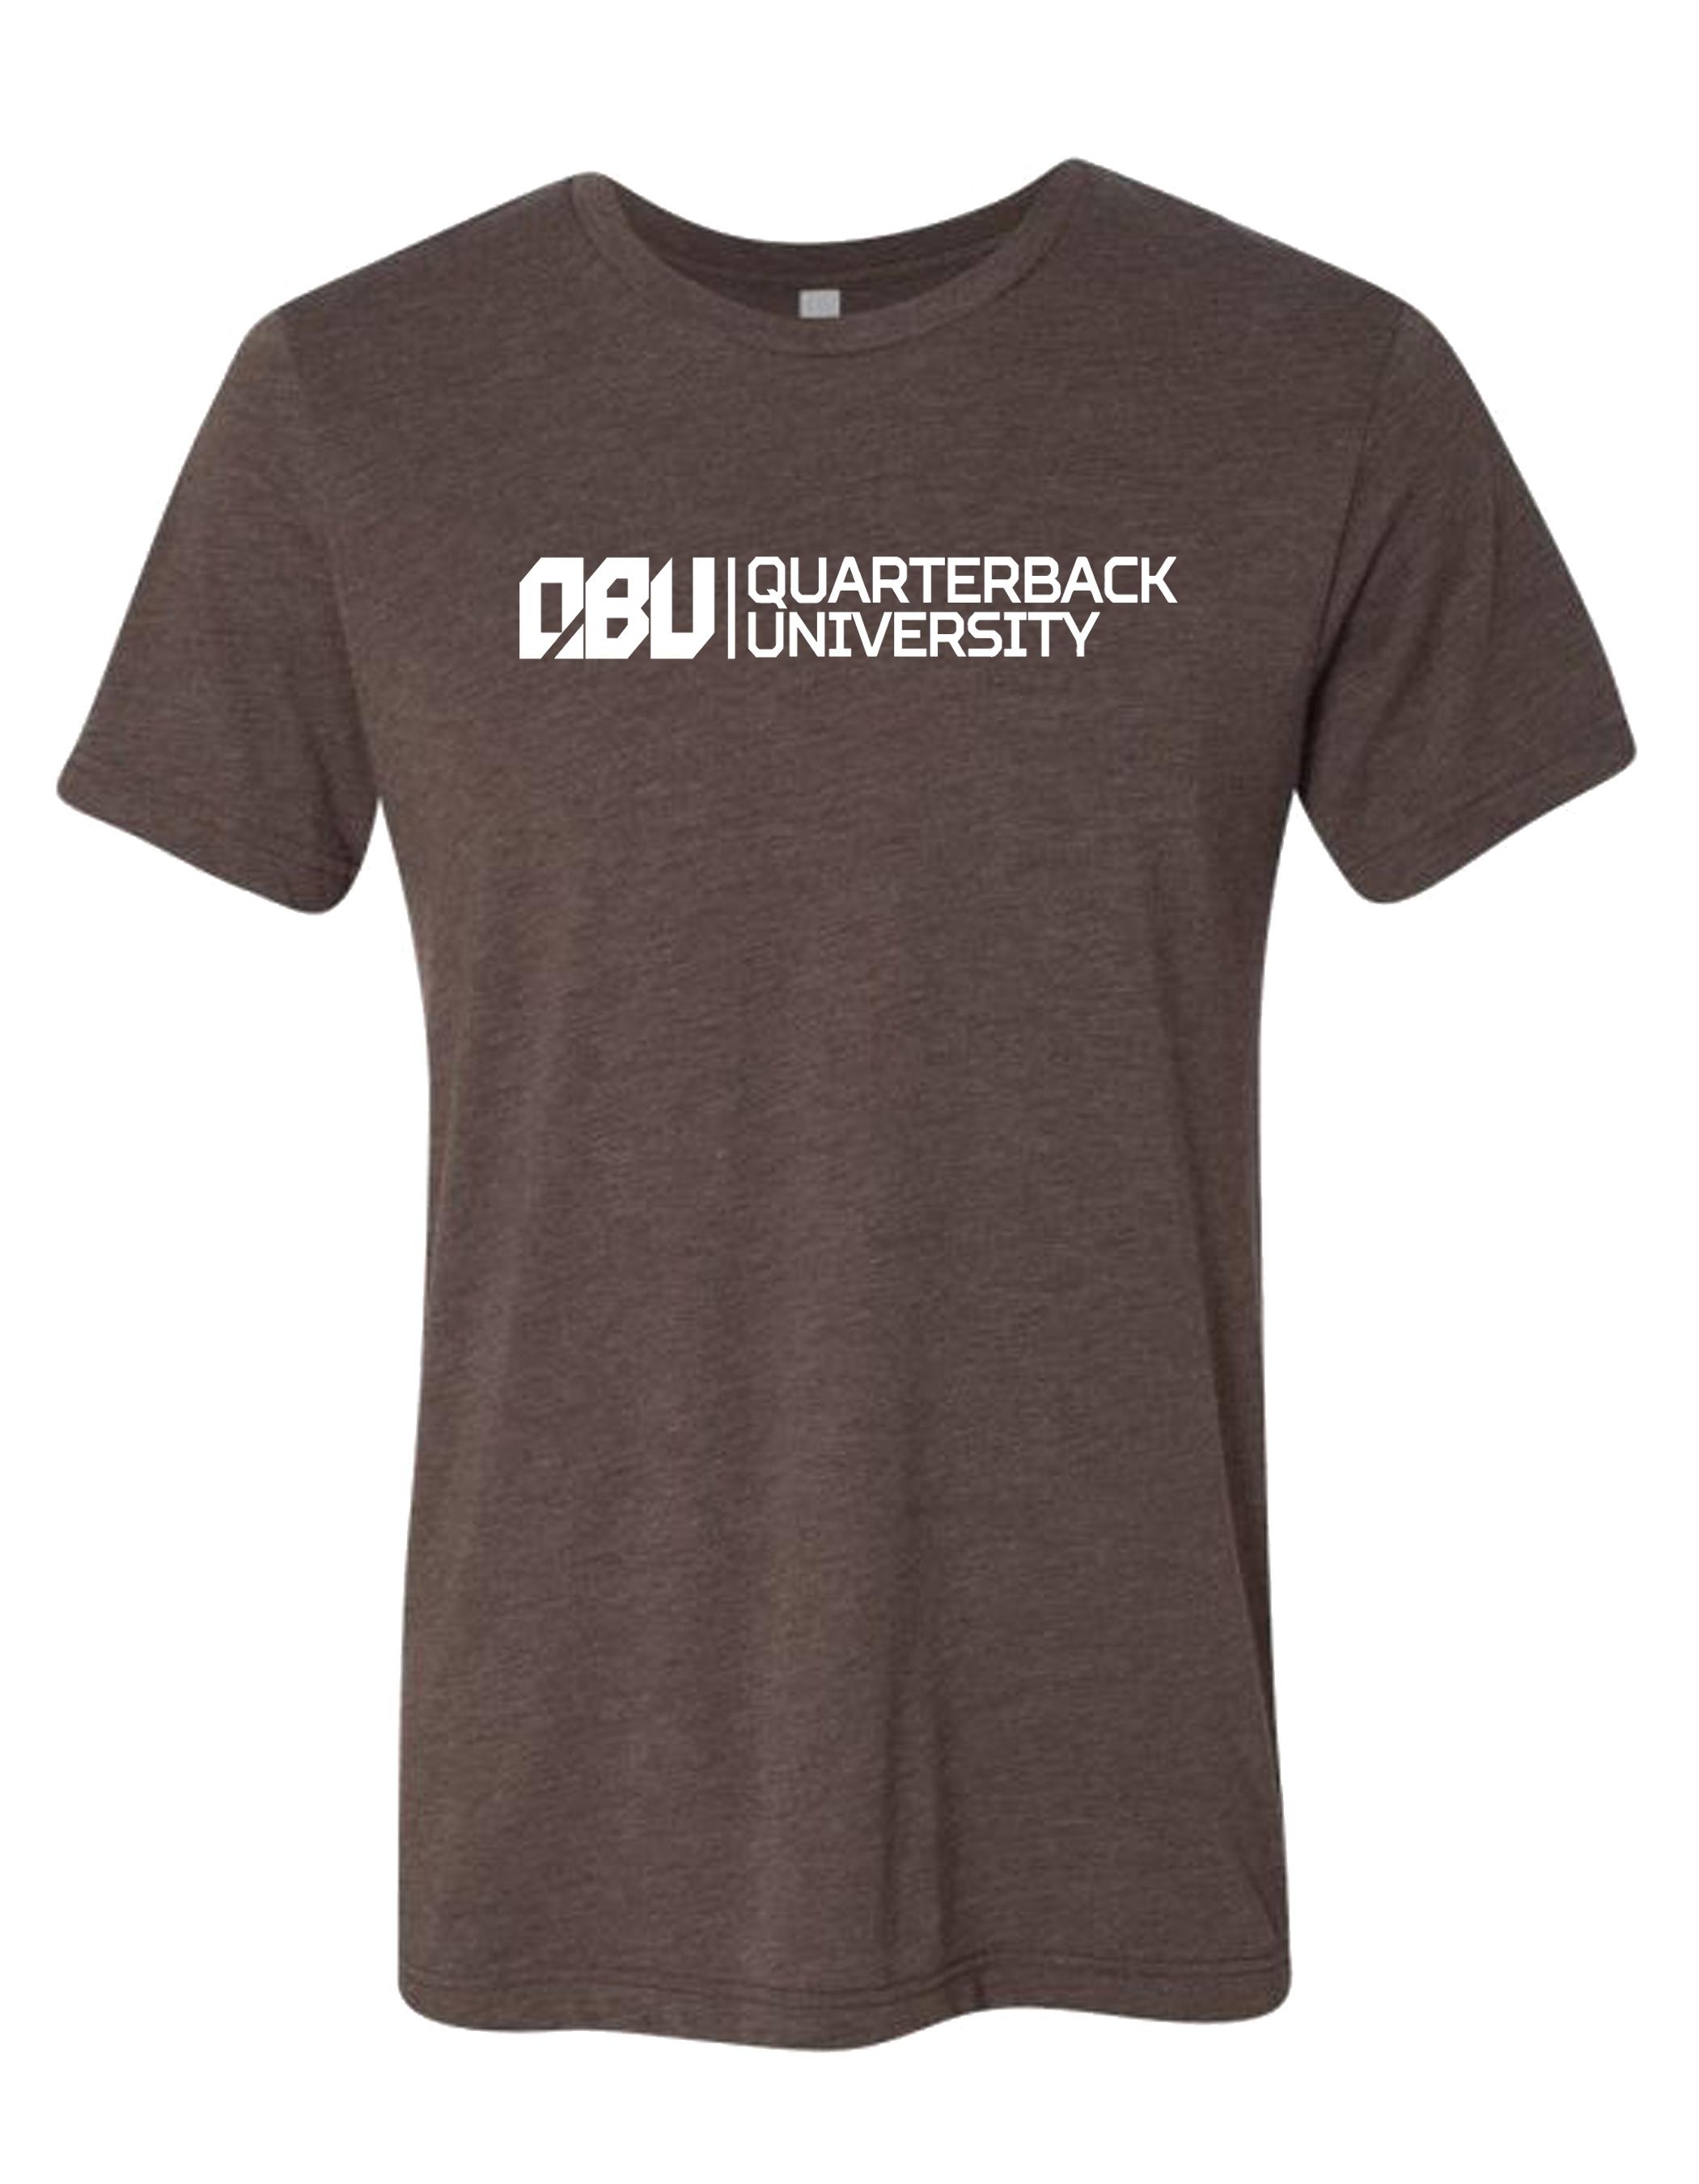 Quarterback University Tee Brown